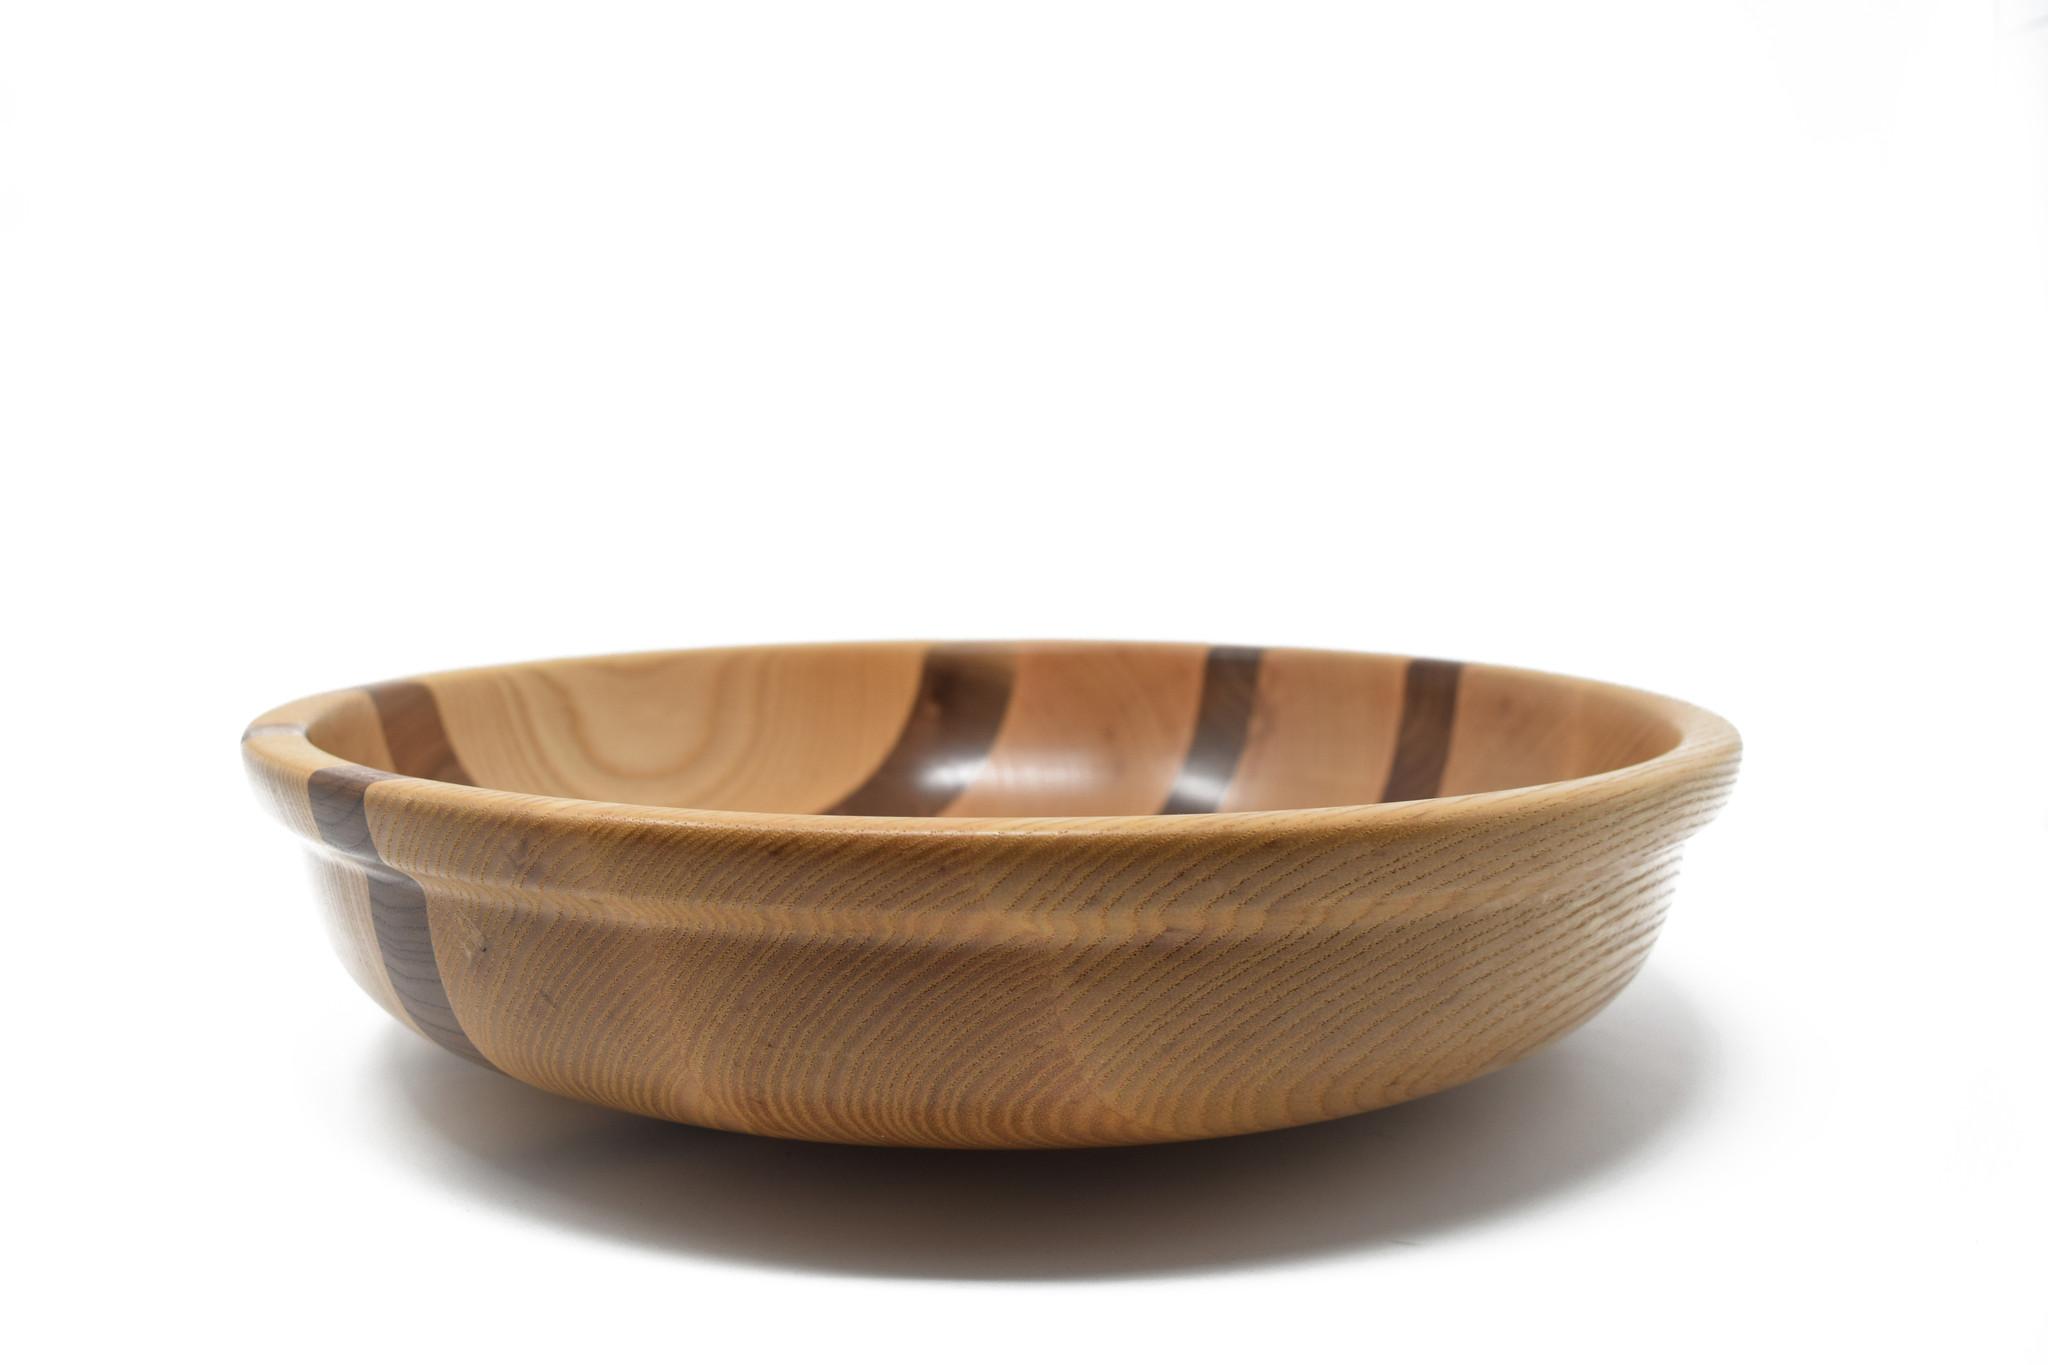 Wood Serving Bowl-2